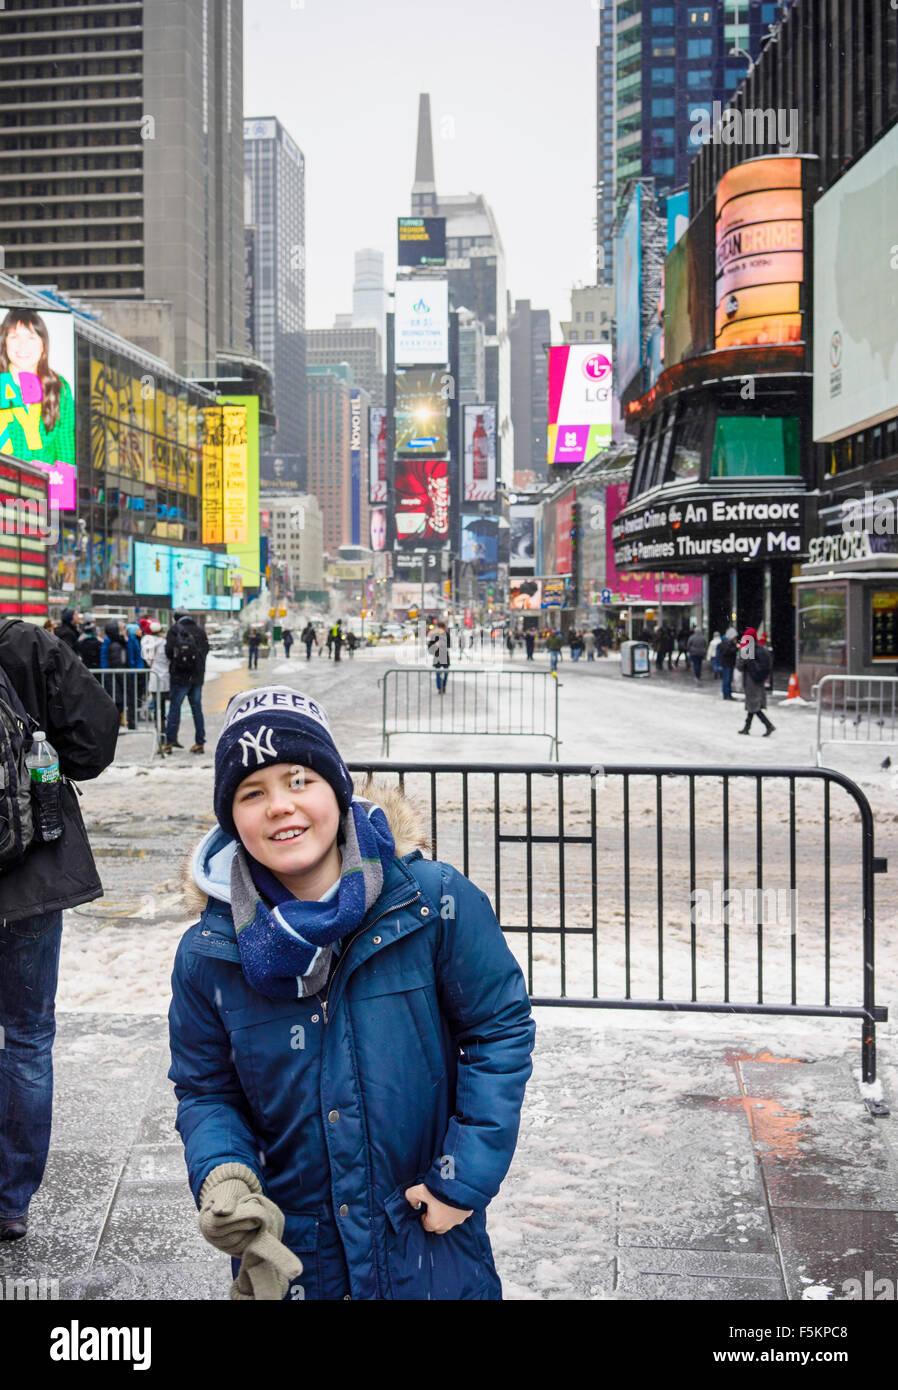 USA, New York, Manhattan, Times Square, Boy (12-13) am Stadtplatz Stockbild